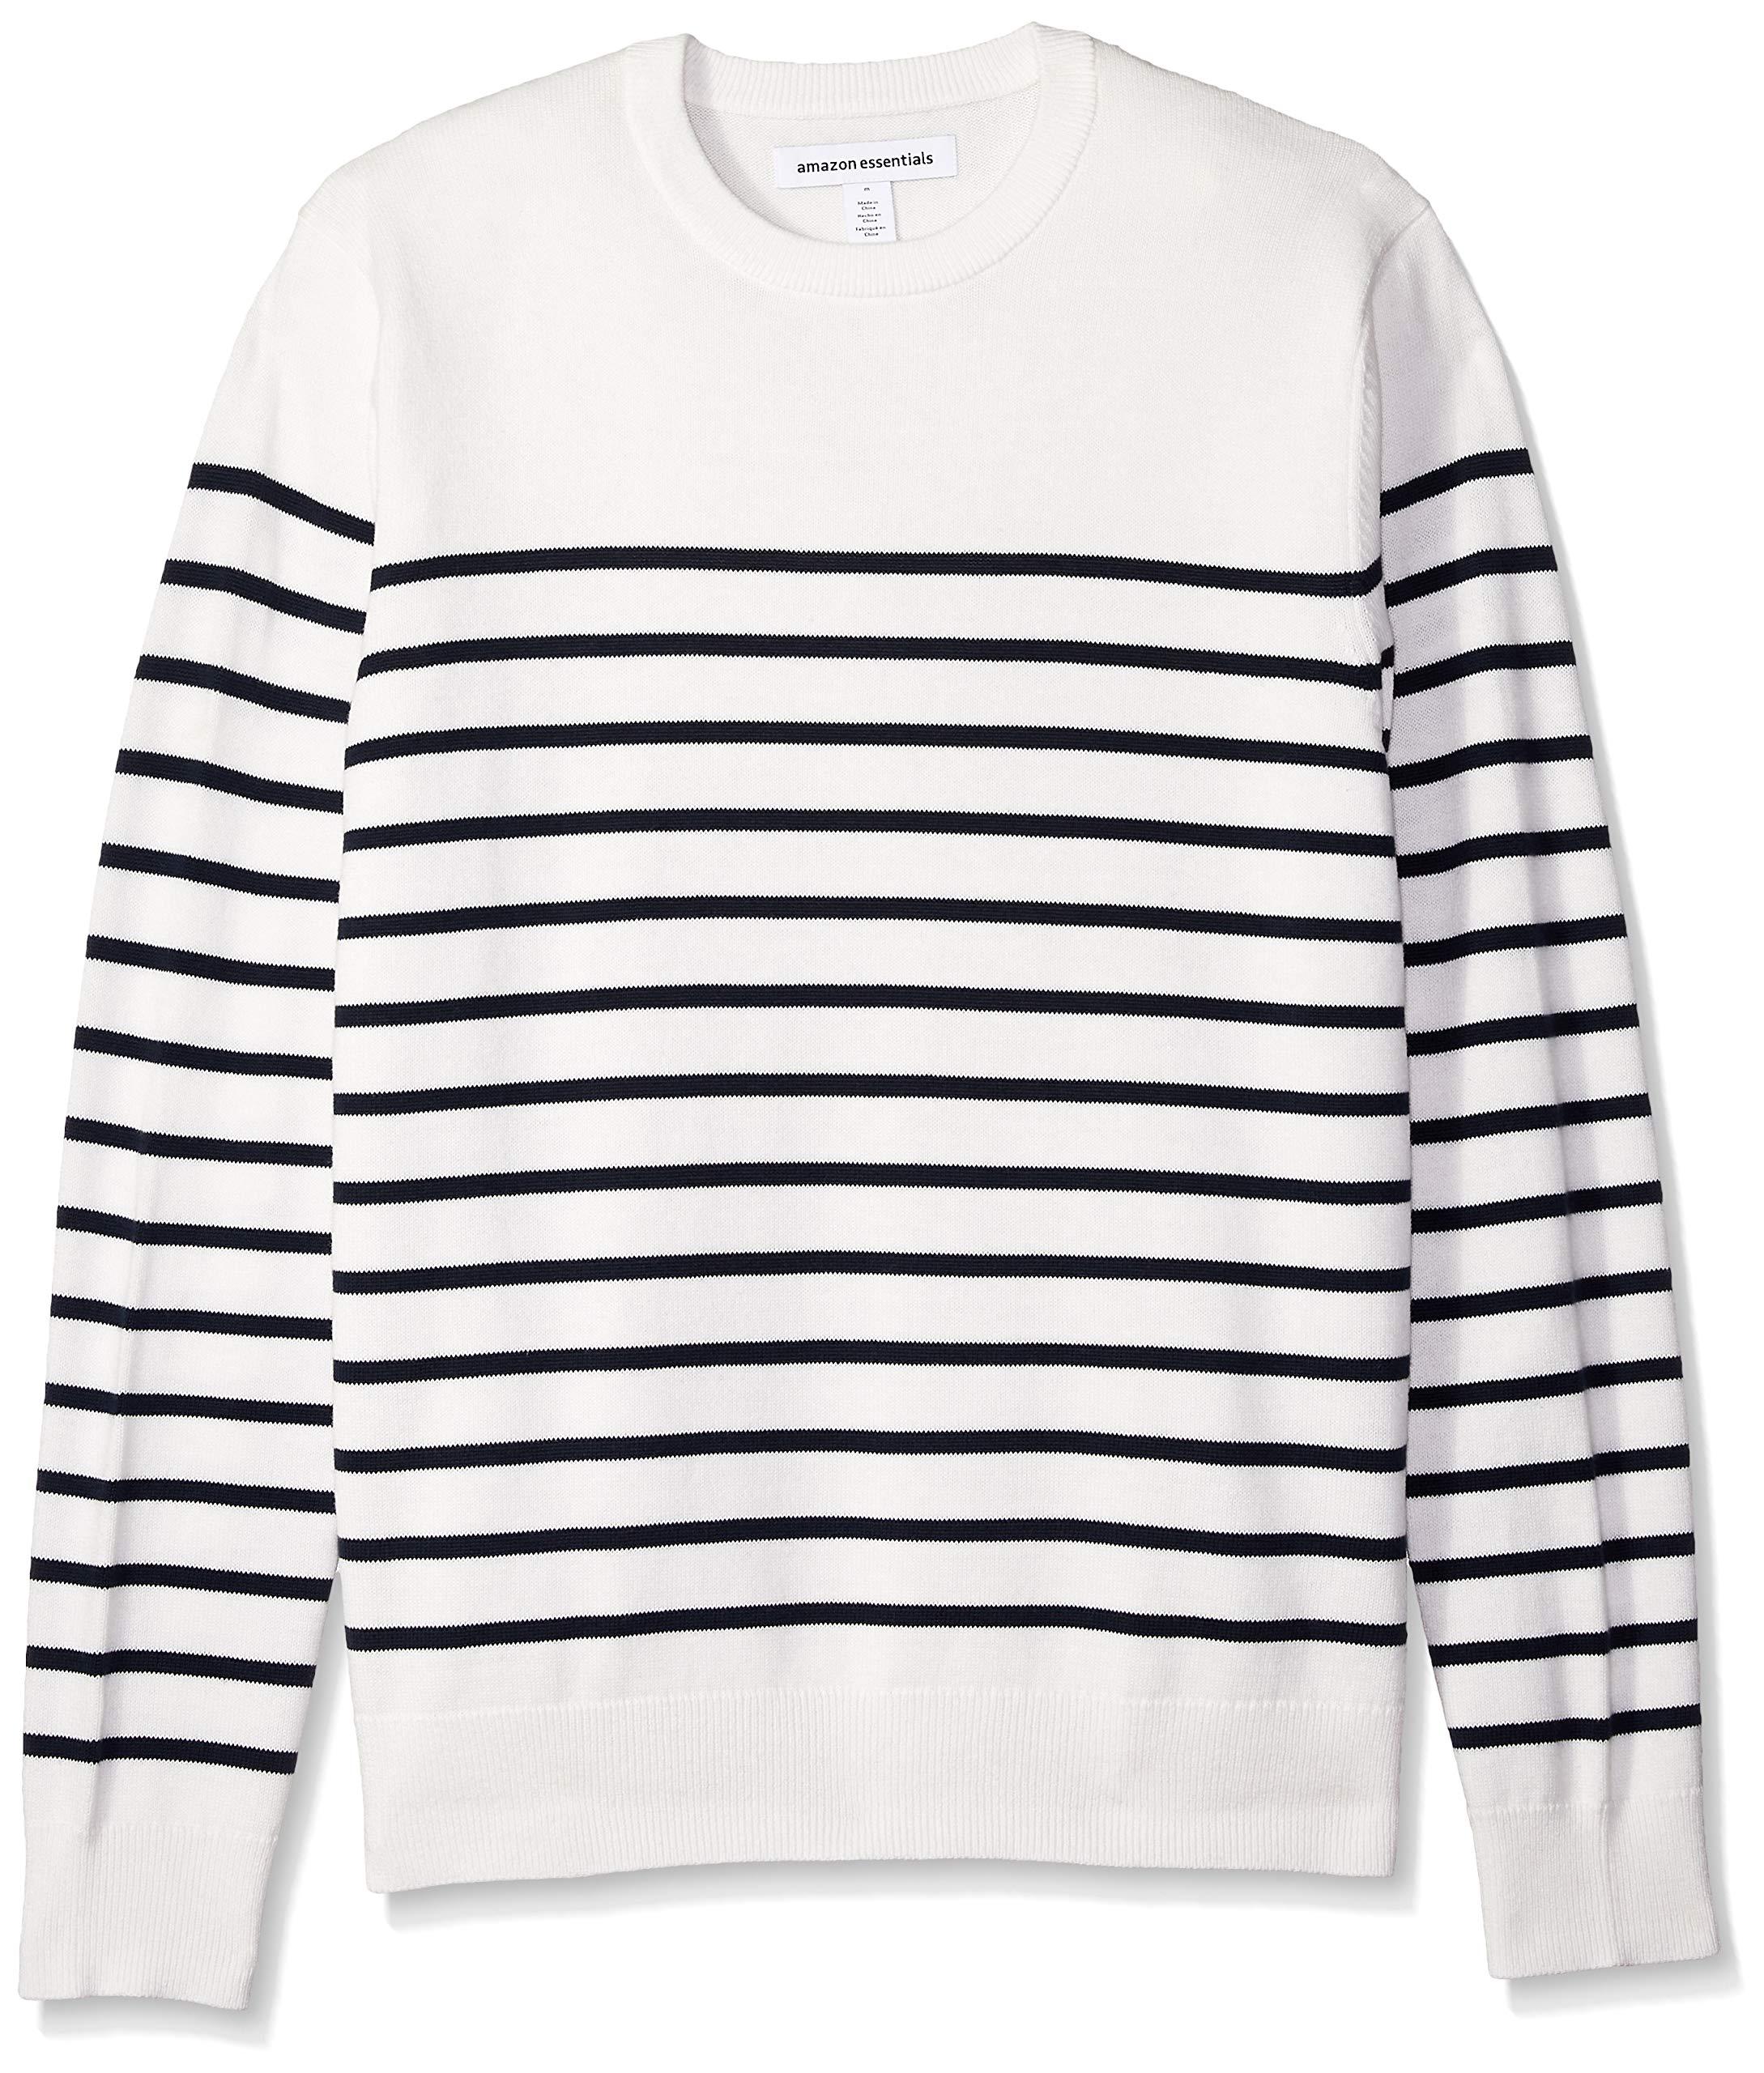 c8a56bfa29 Amazon Essentials Men s Crewneck Stripe Sweater